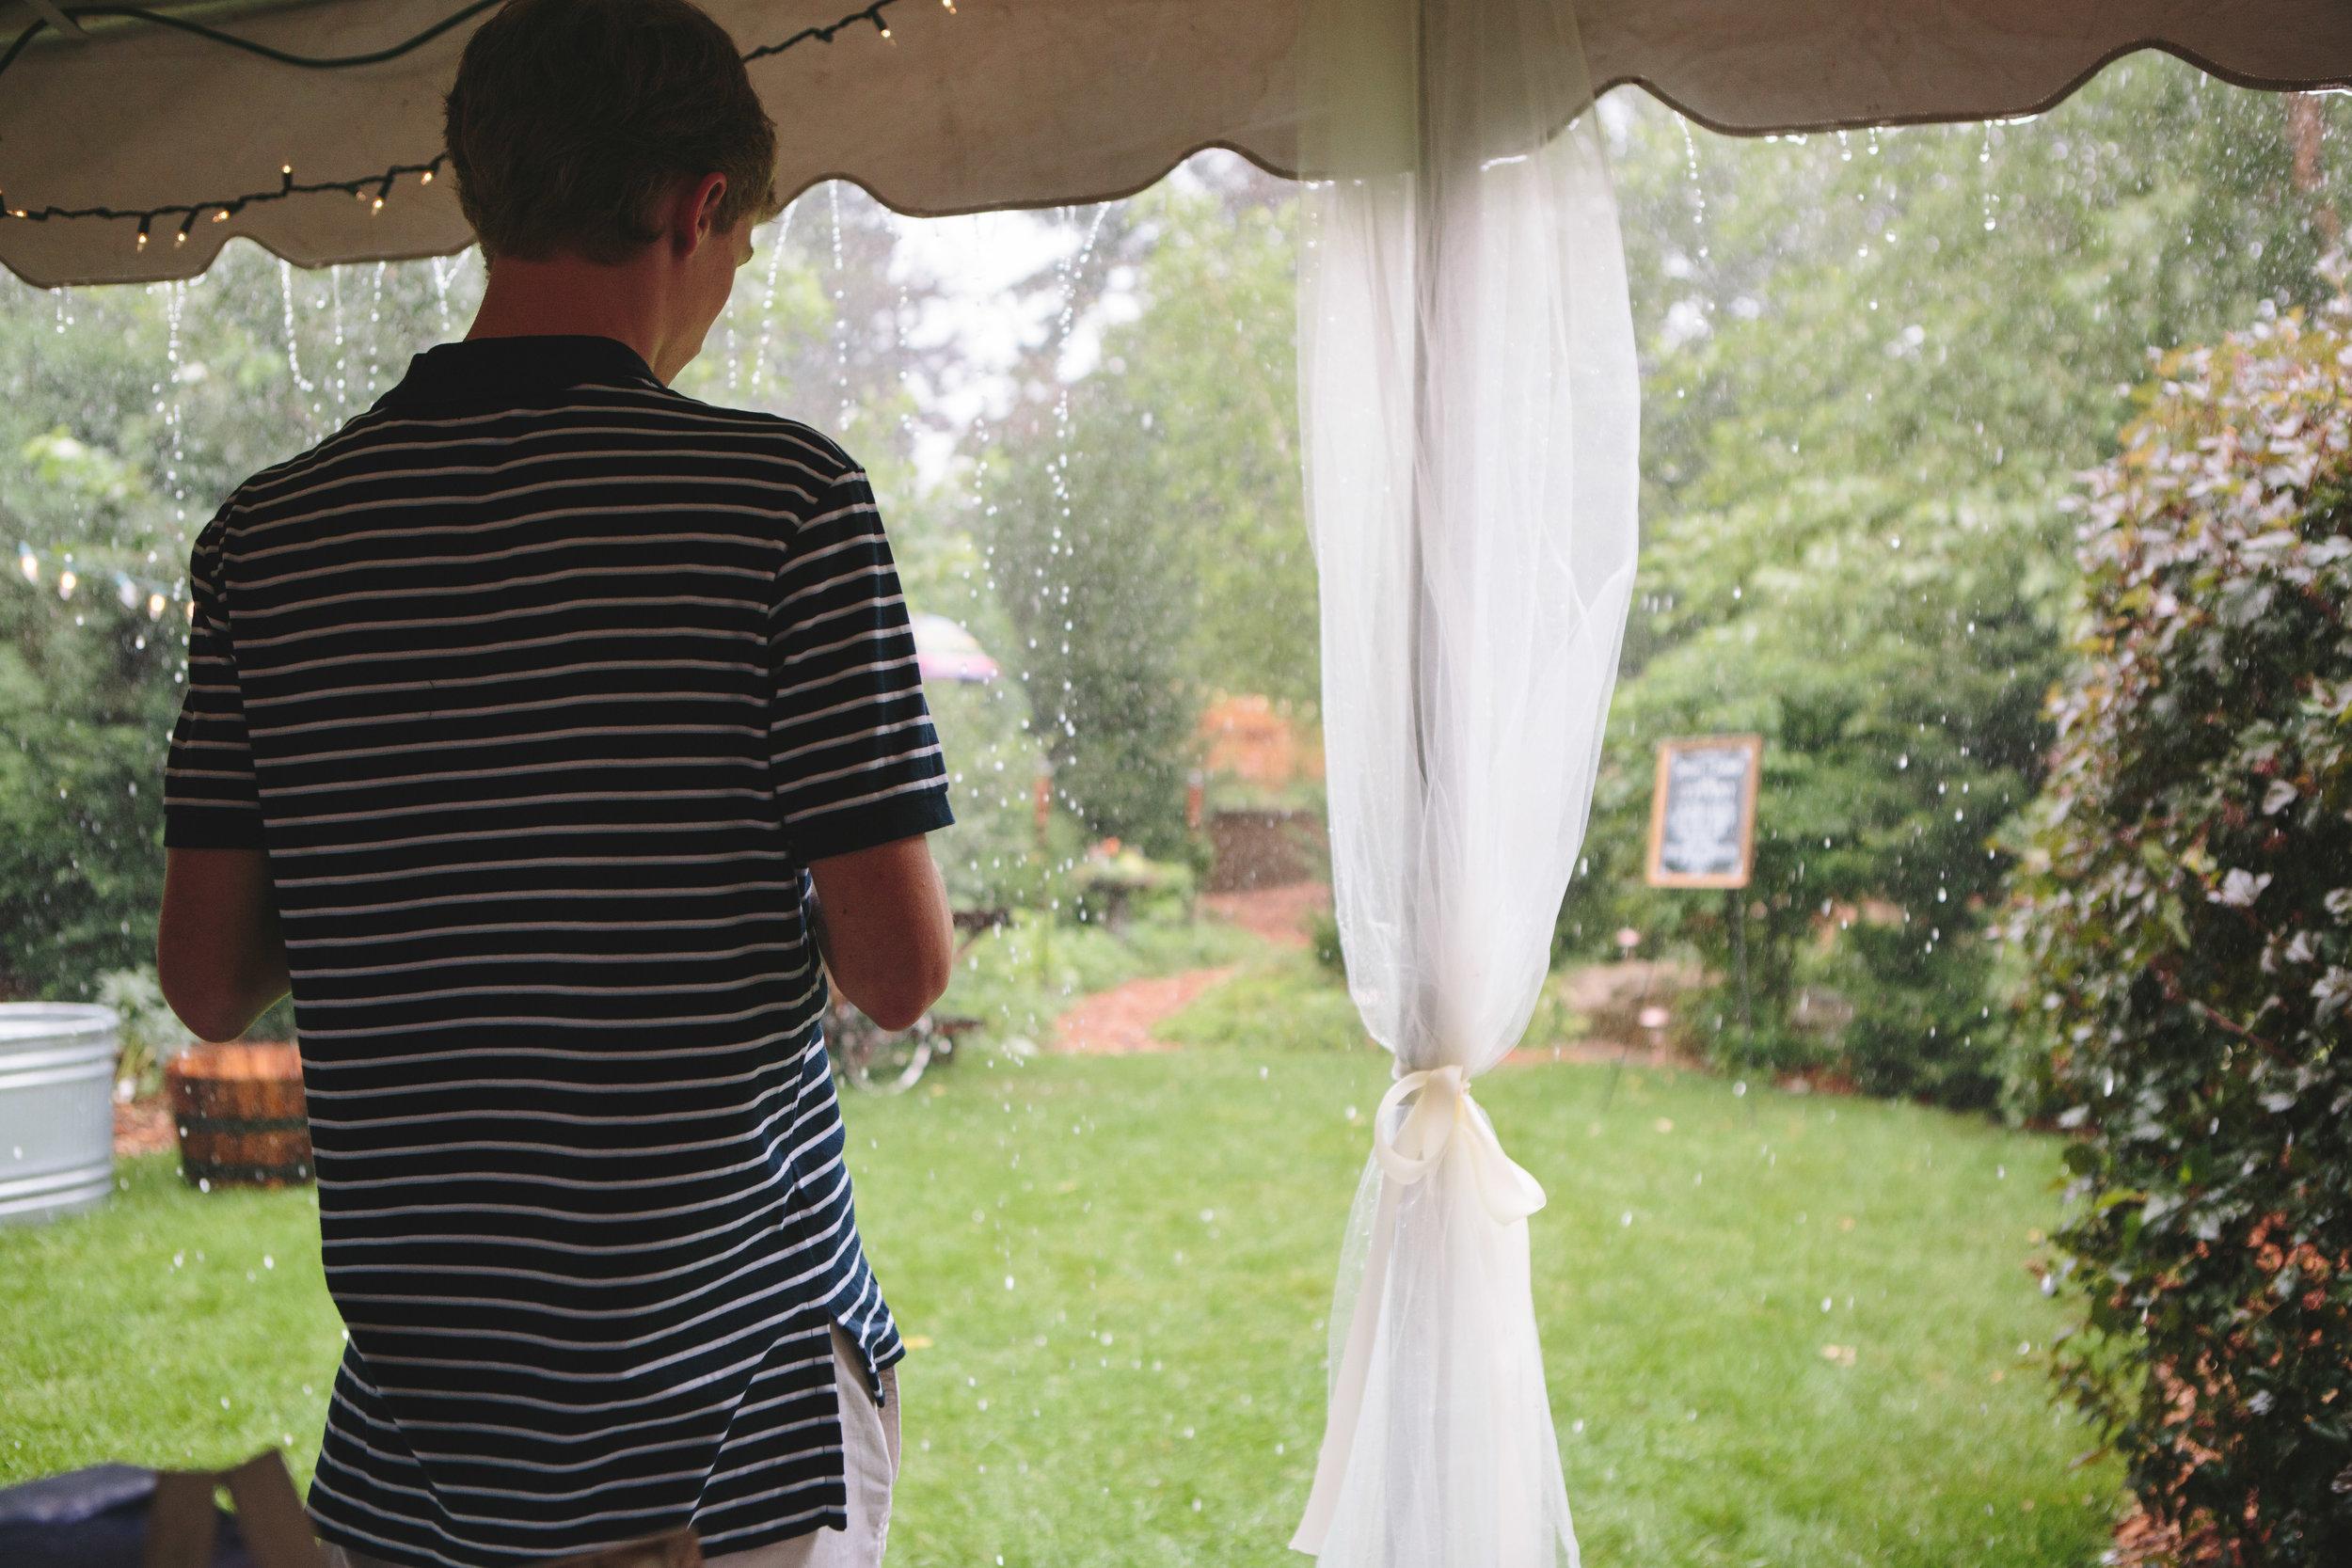 tented wedding reception, prepare for rain on wedding day, backyard wedding reception inspiration